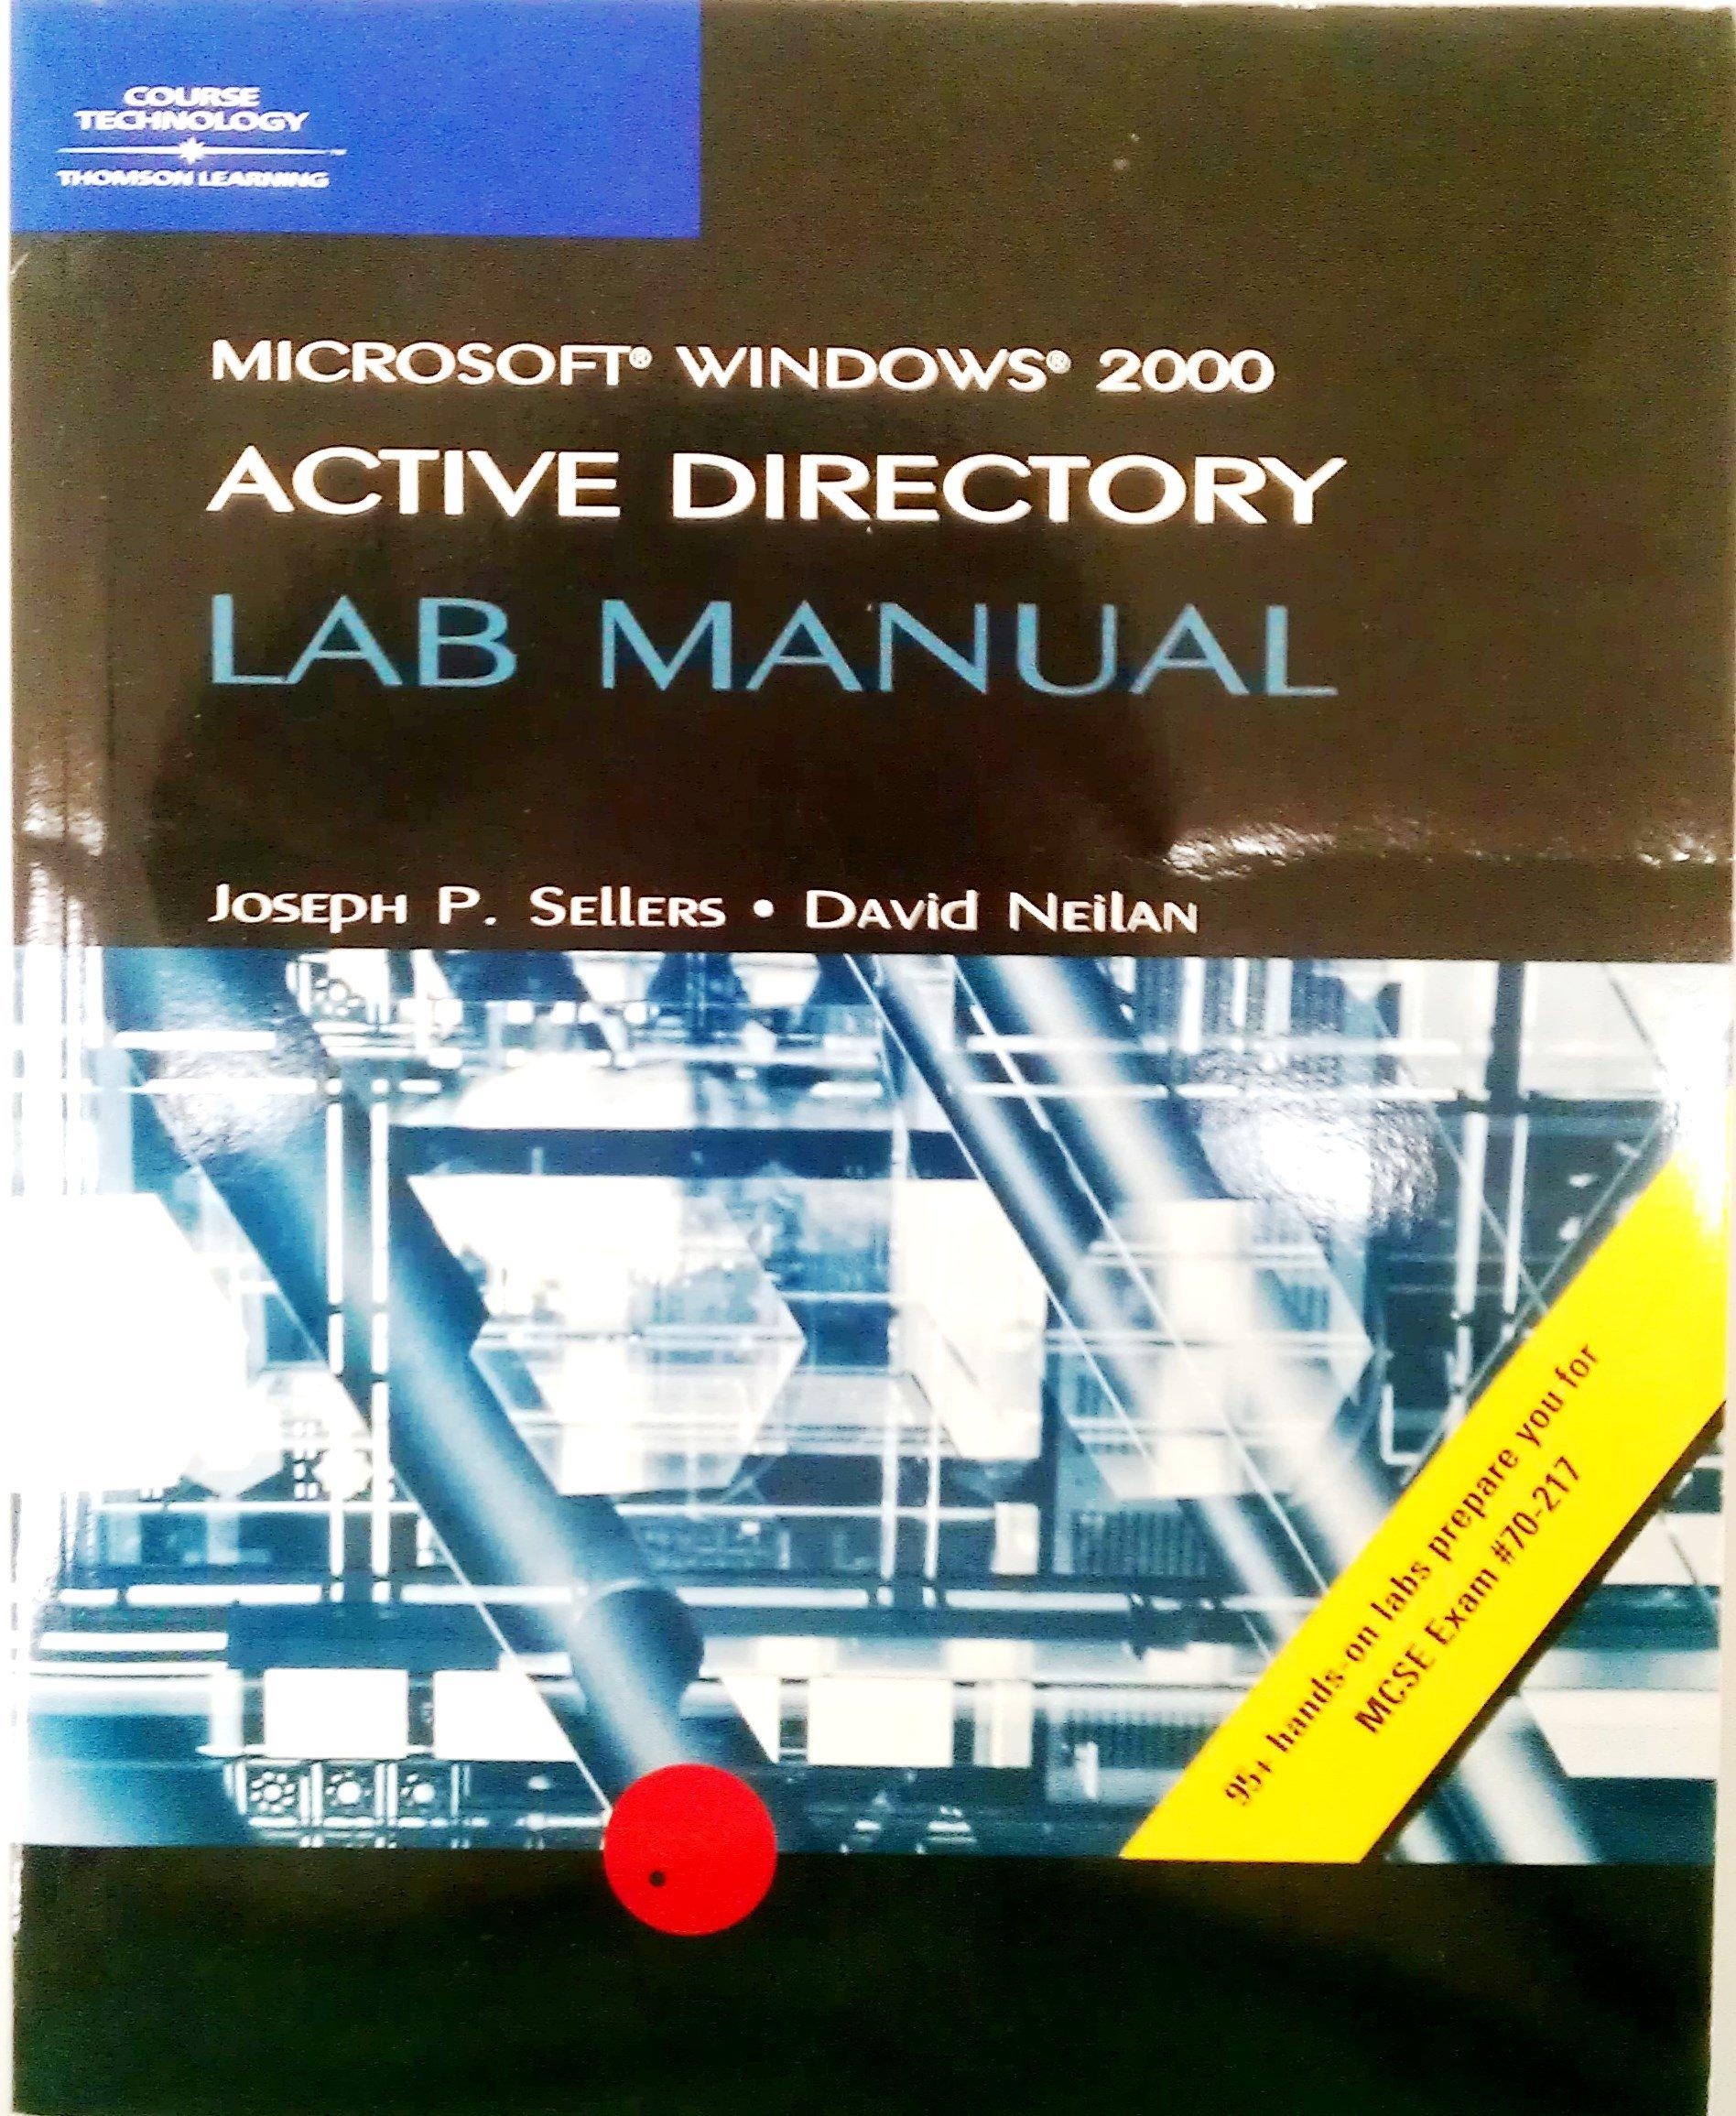 McSe Lab Manual for Microsoft Windows 2000 Active Directory: Ian Gorton,  Course Technology: 9780619016913: Amazon.com: Books